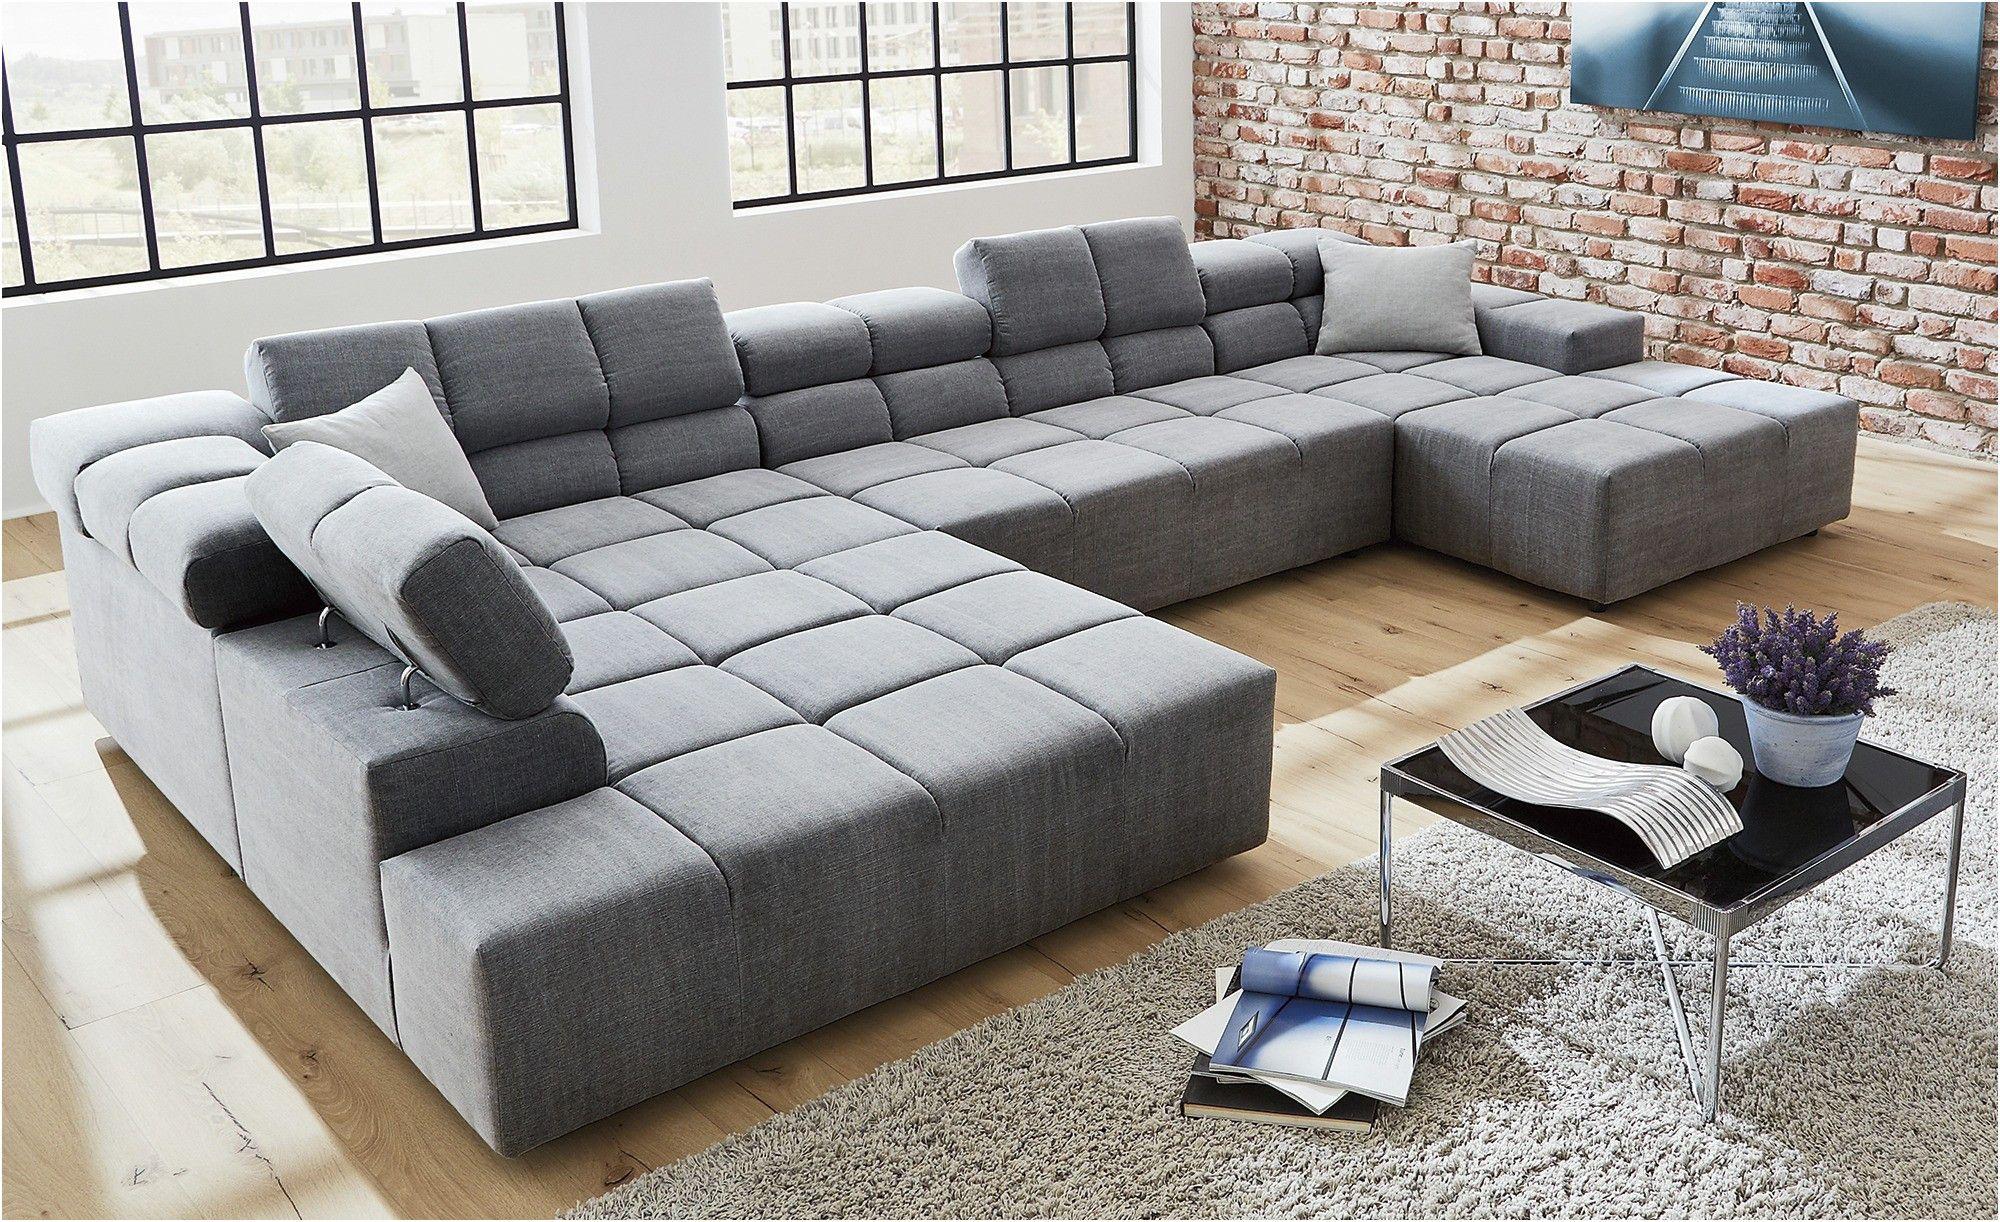 Full Size of Big Sofa Xxl Wohnlandschaft U Form Full Size Furniture Bullfrog Patchwork Chesterfield Grau Modulares Cassina Sitzsack Günstig Stressless Hersteller Wk Sofa Big Sofa Xxl